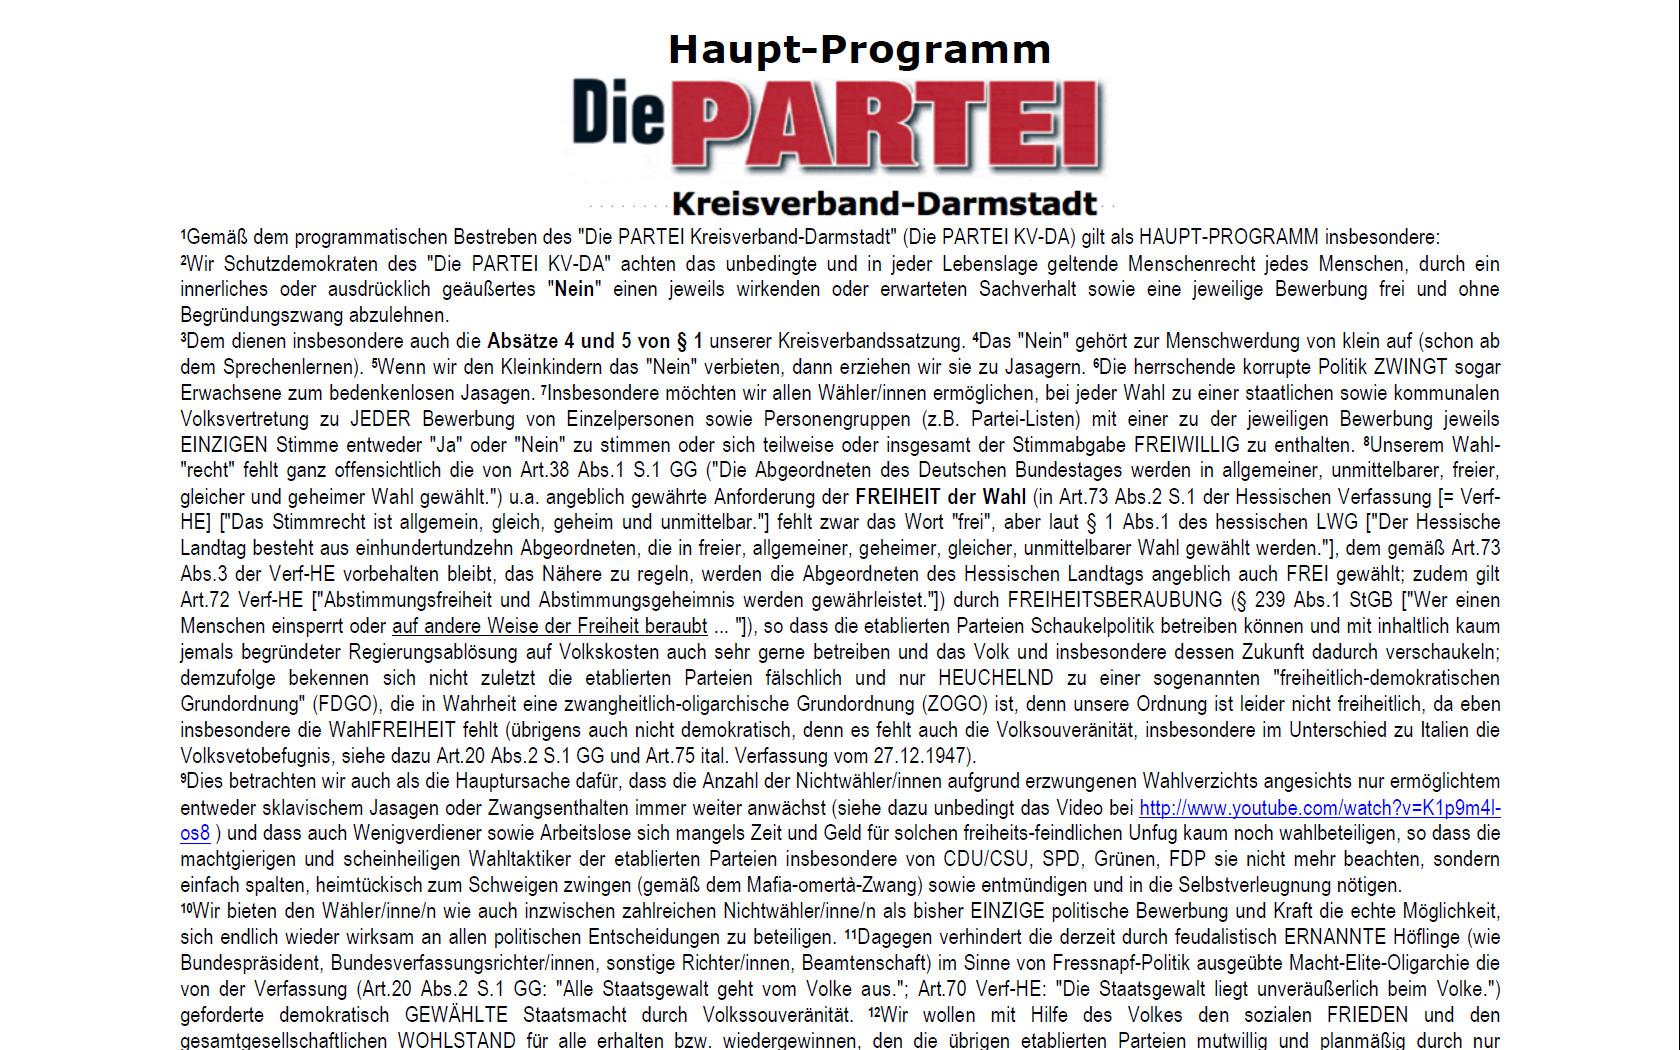 dieparteidarmstadt_programm